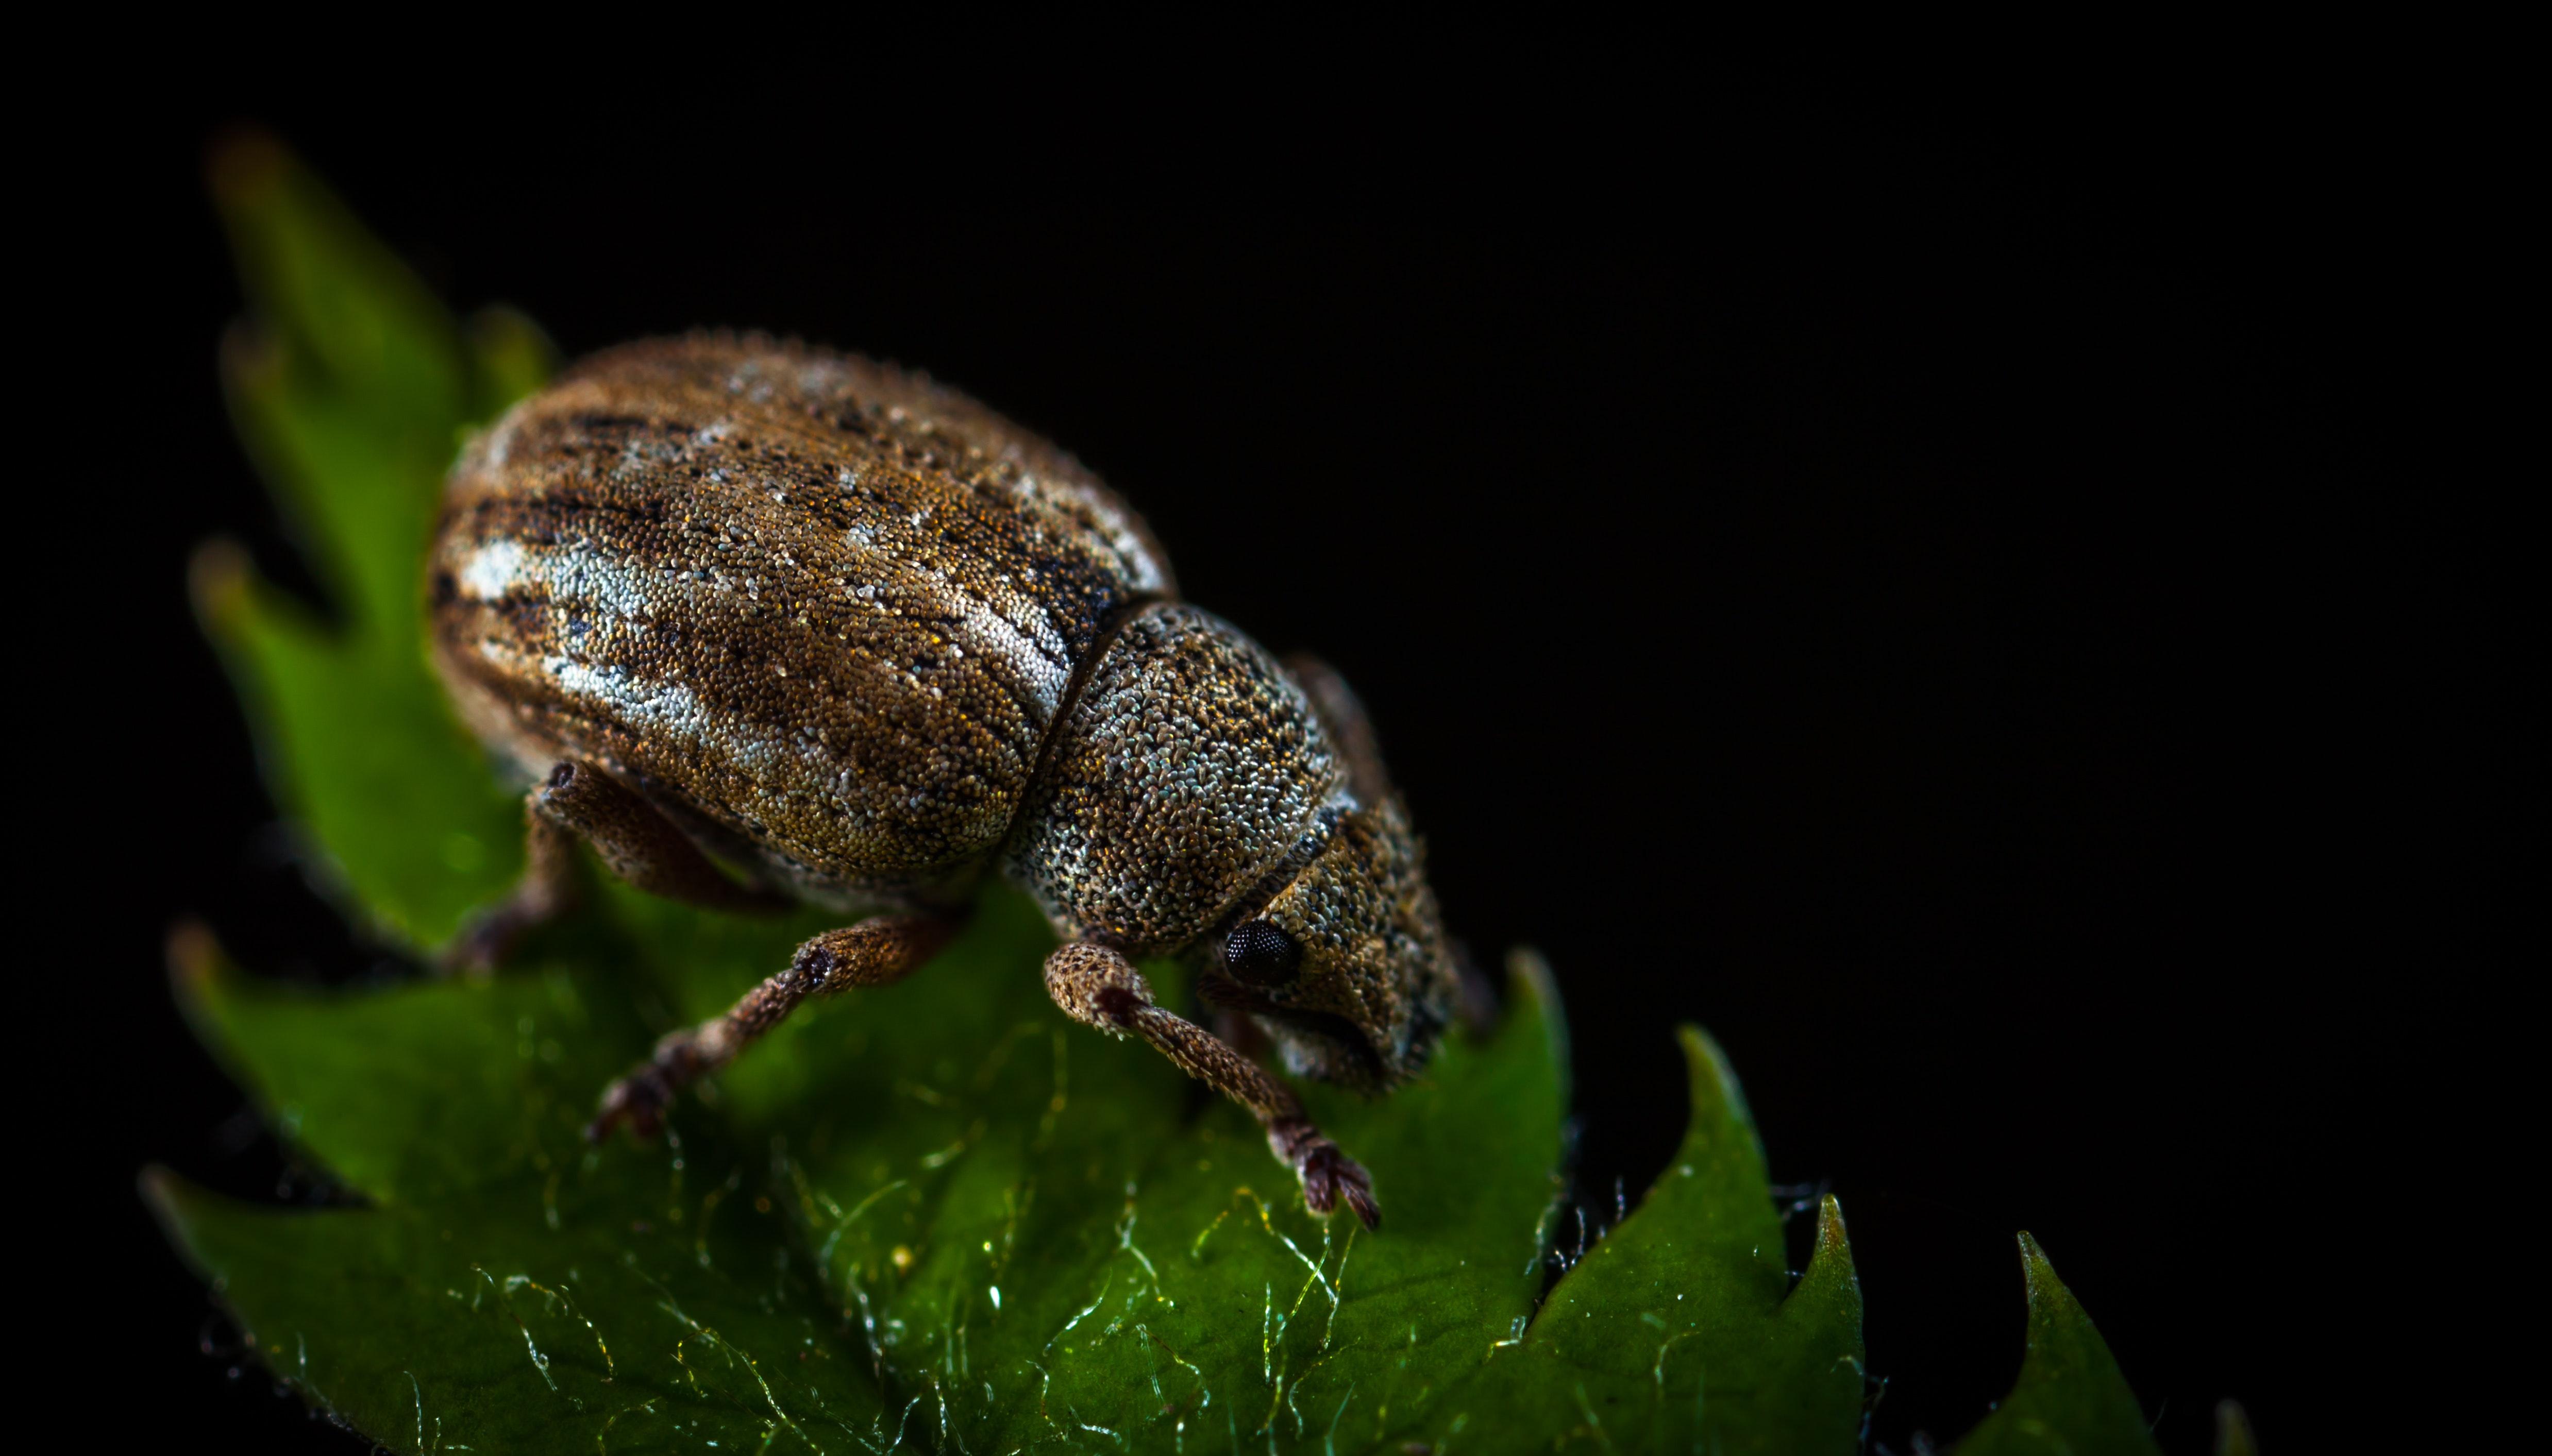 Macro Photography of Brown Weevil on Green Leaf, Animal, Beetle, Biology, Black background, HQ Photo